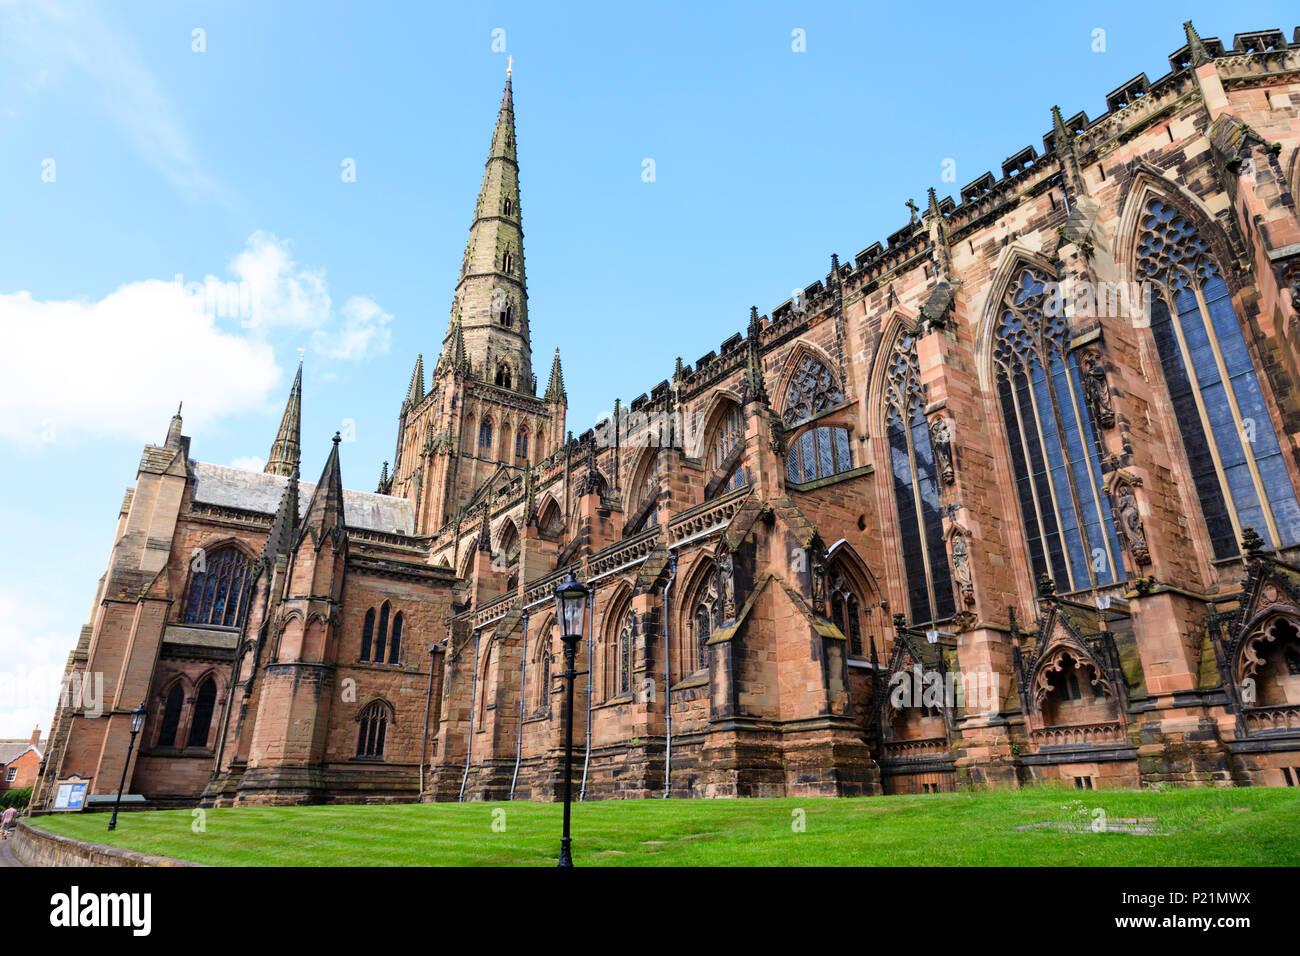 Lichfield Cathedral, Lichfield Staffordshire, England - Stock Image